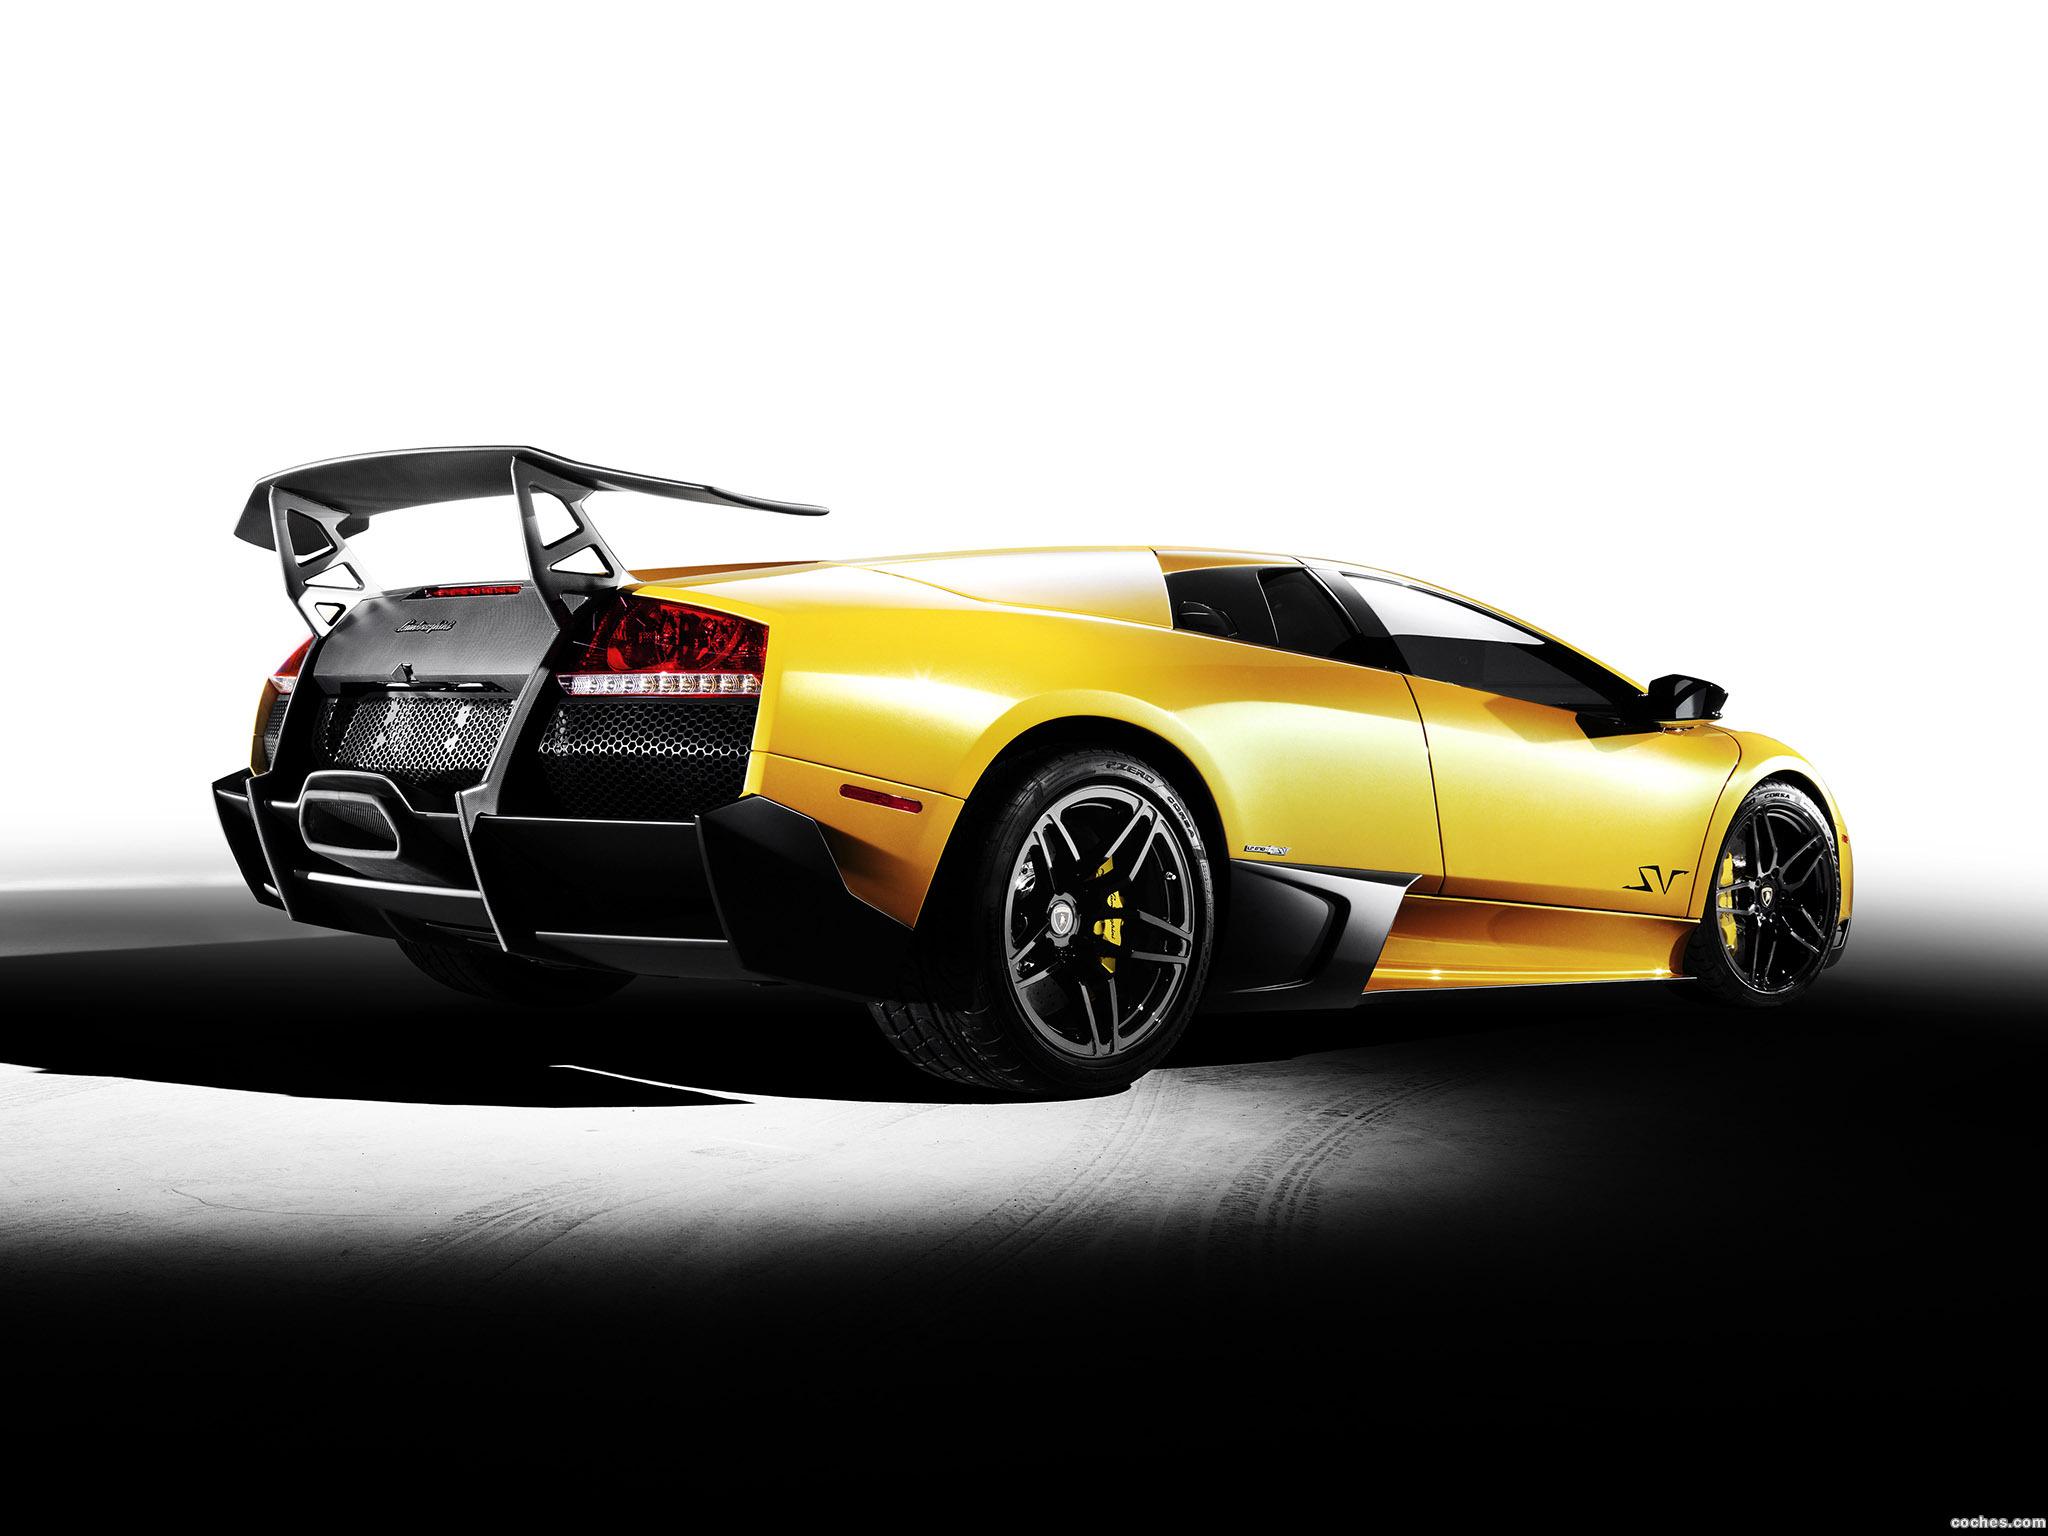 Foto 16 de Lamborghini Murcielago LP 670-4 SuperVeloce 2009